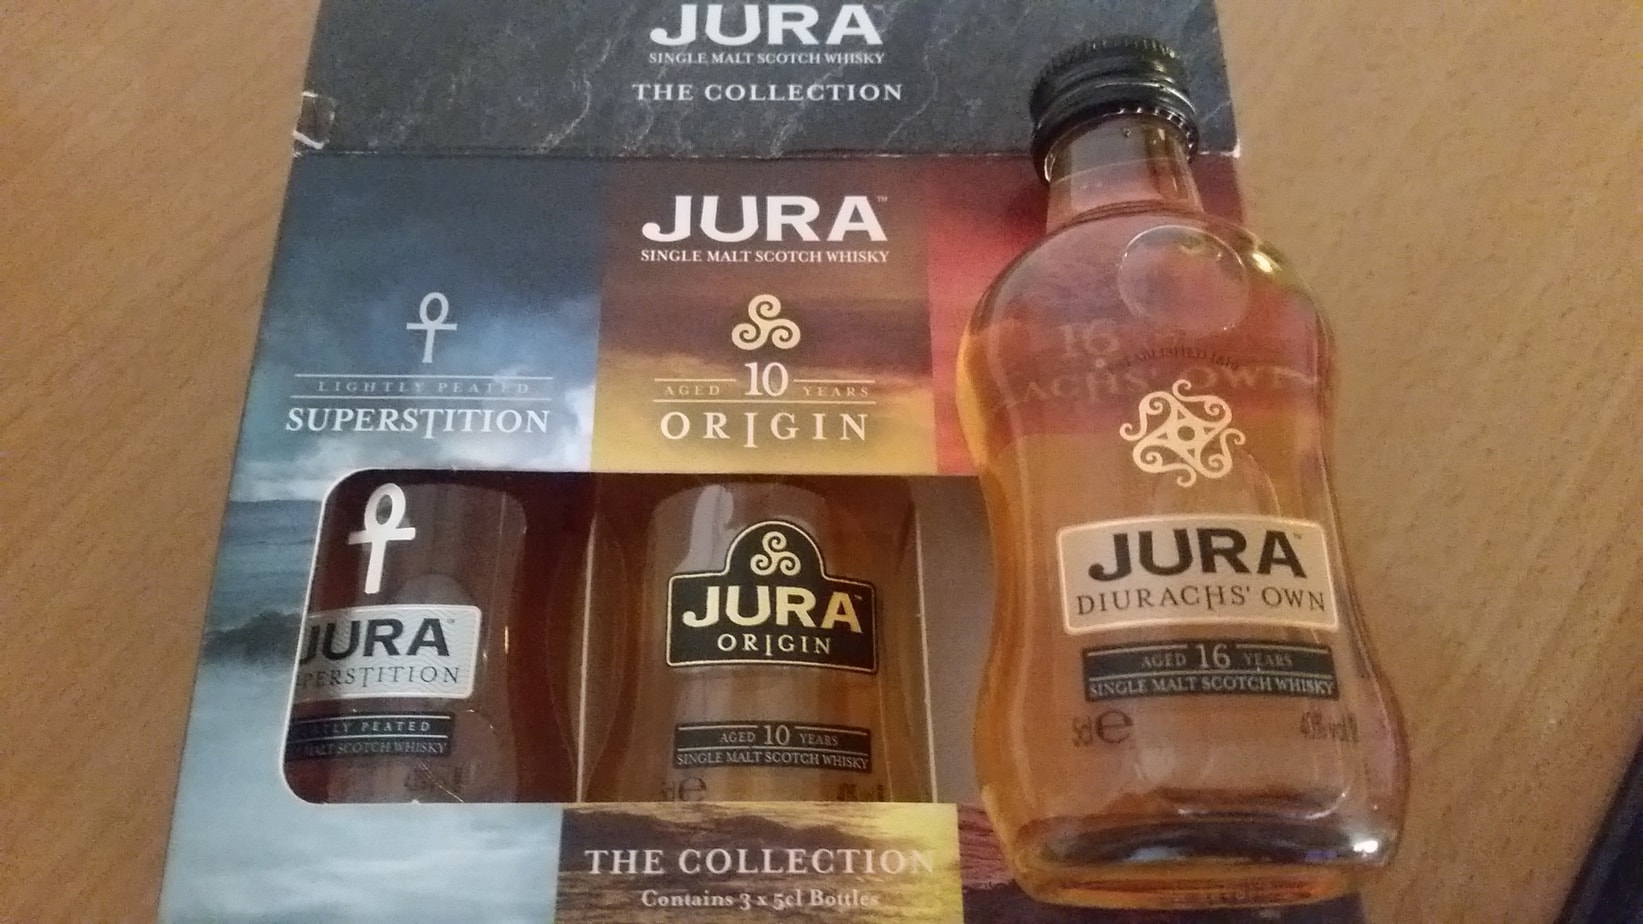 Jura 16 Diurachs Own bottle